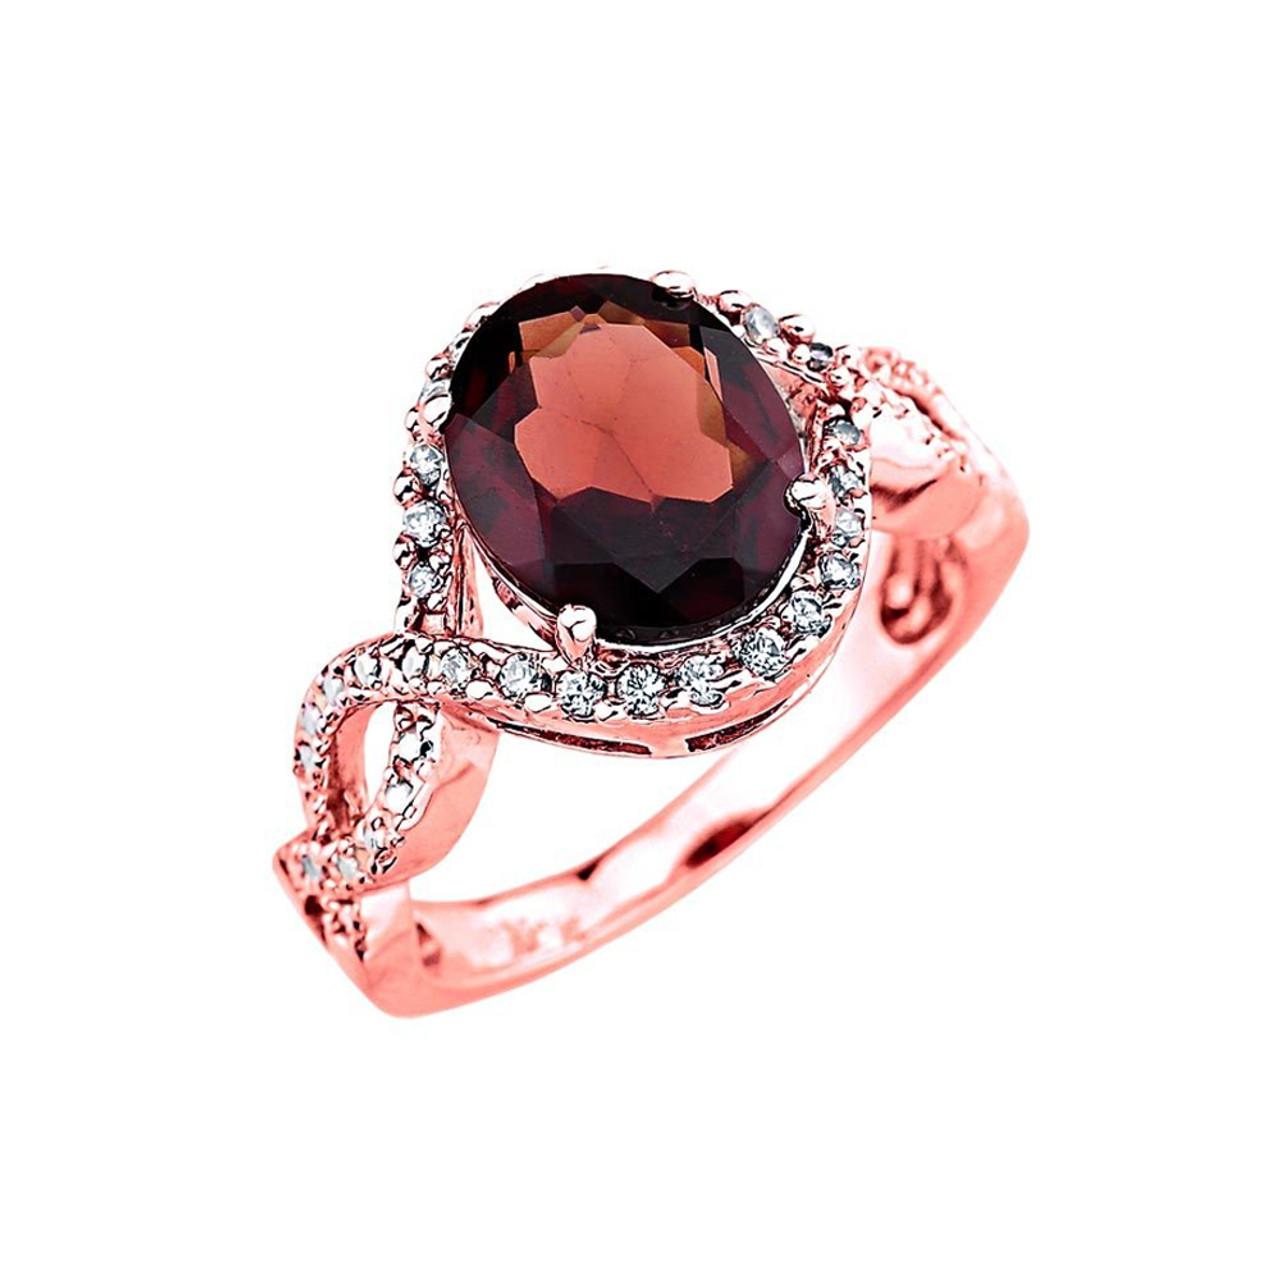 Engagement Ring Garnet Engagement Ring White Gold Garnet Engagement Ring Garnet Solitaire Engagement Ring Garnet January Birthstone Ring